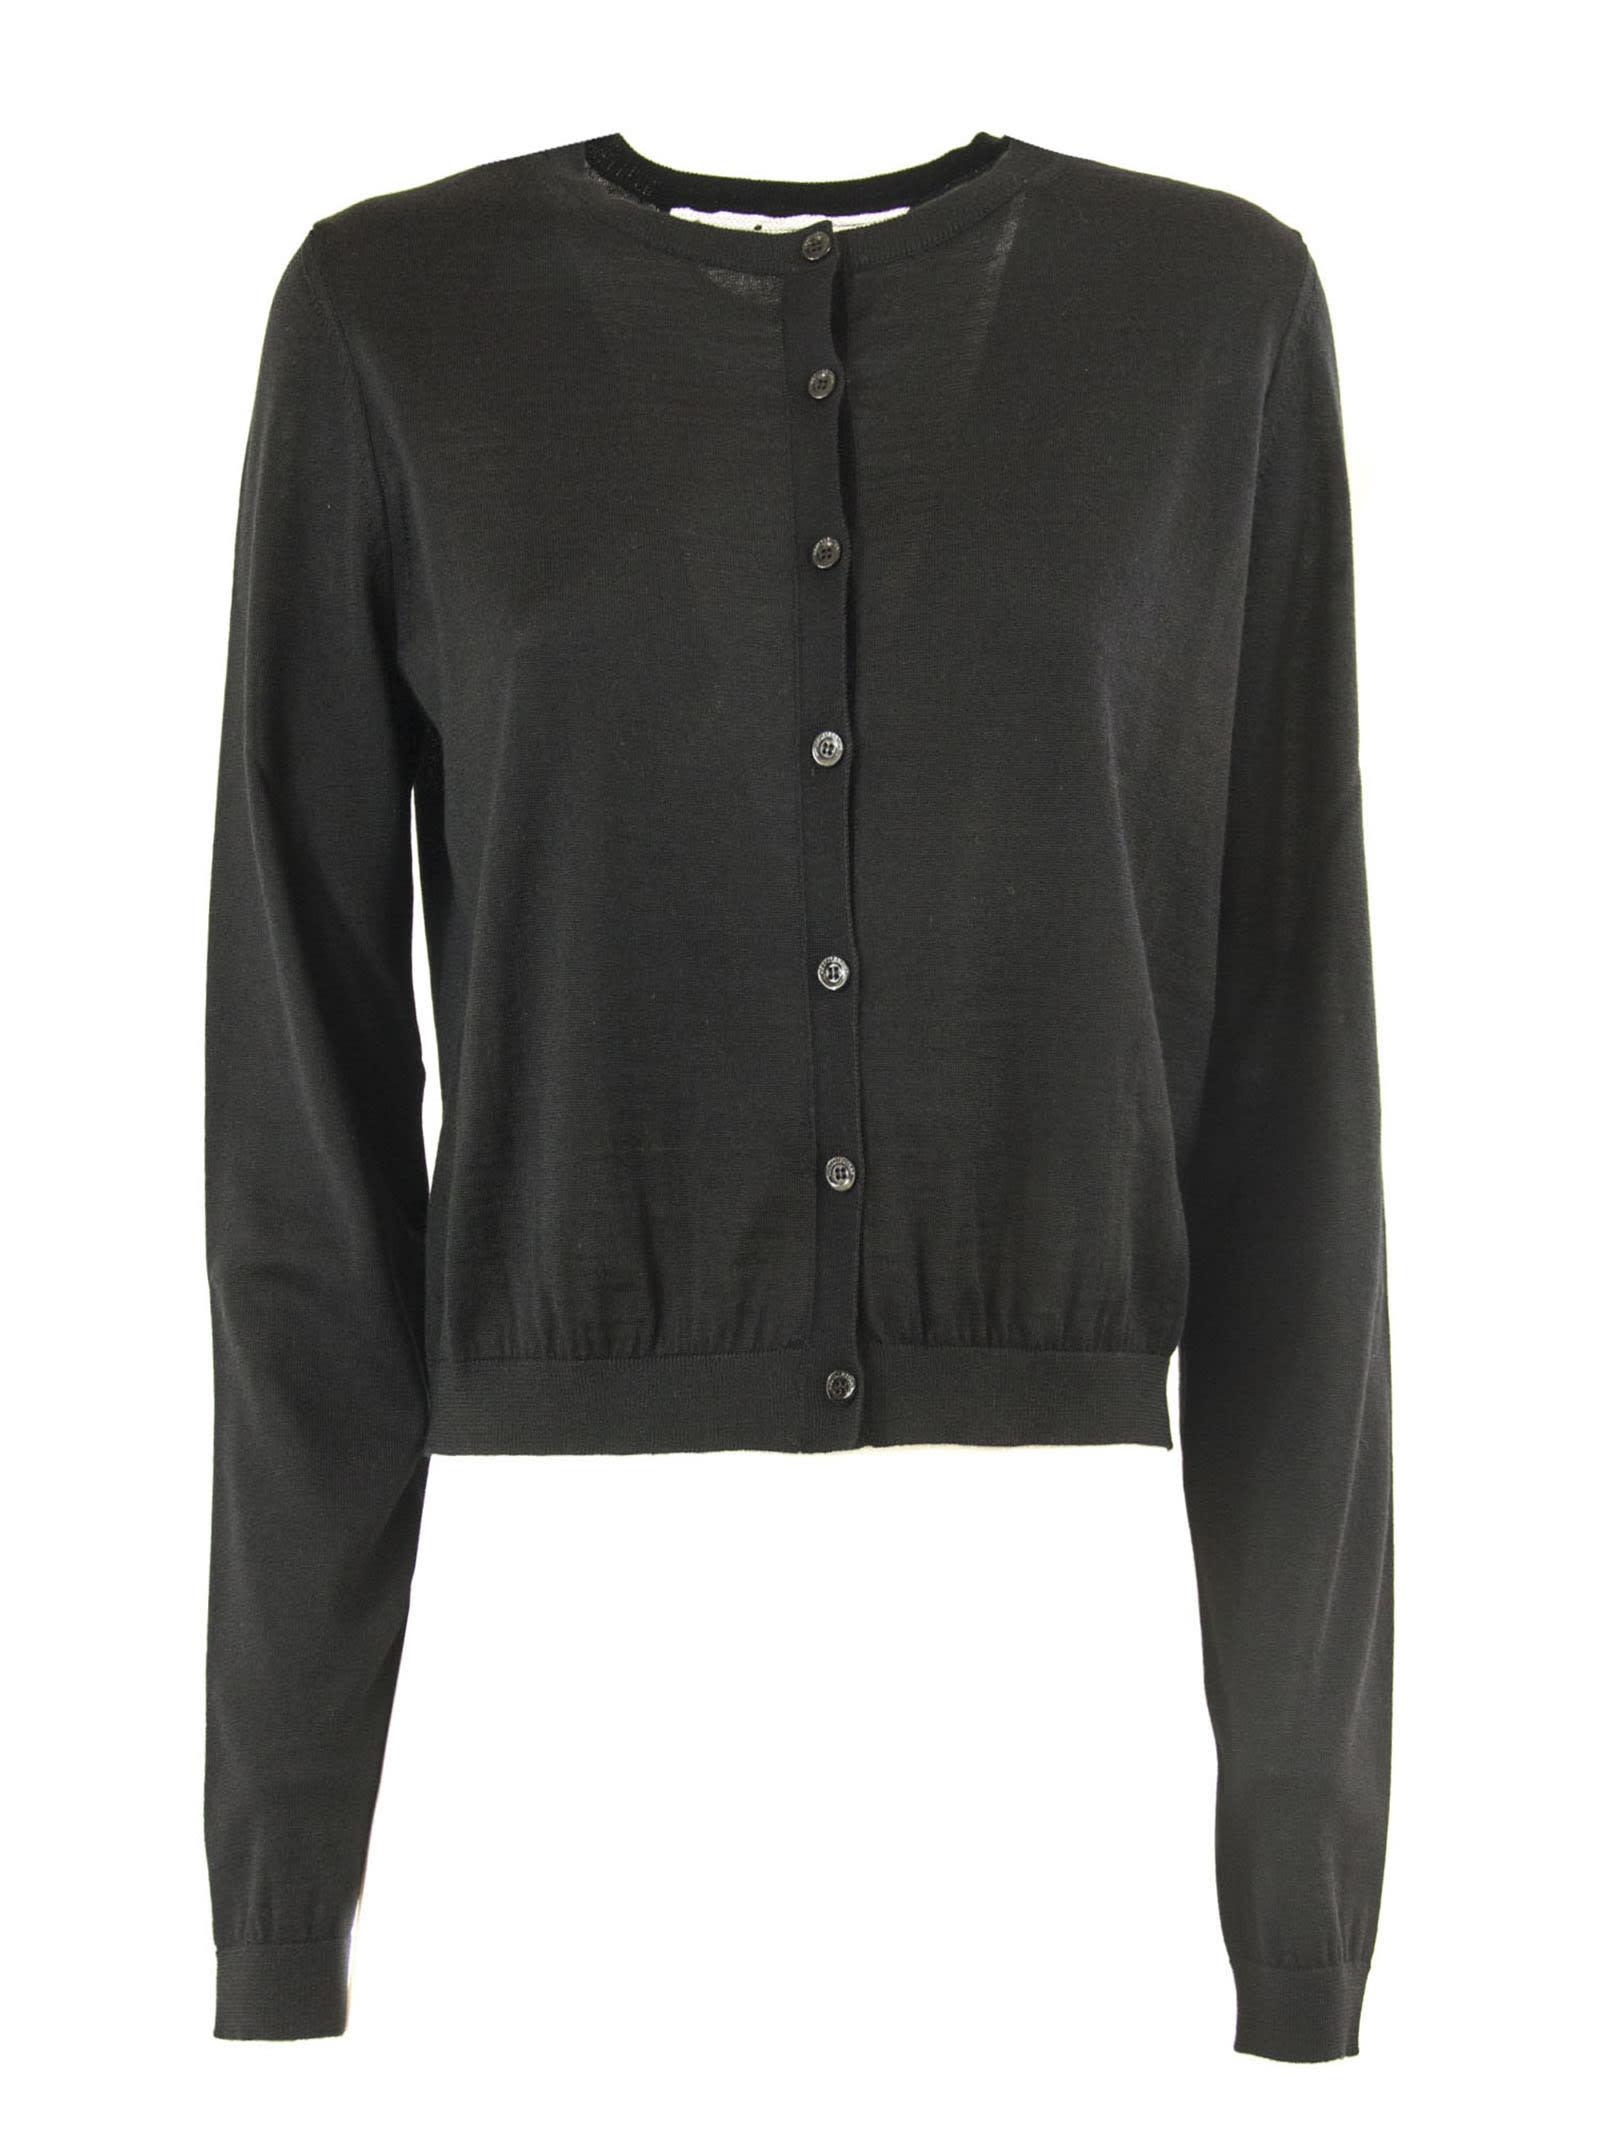 foto ufficiali 21a11 98916 RED Valentino Black Wool, Silk And Cashmere Blend Cardigan